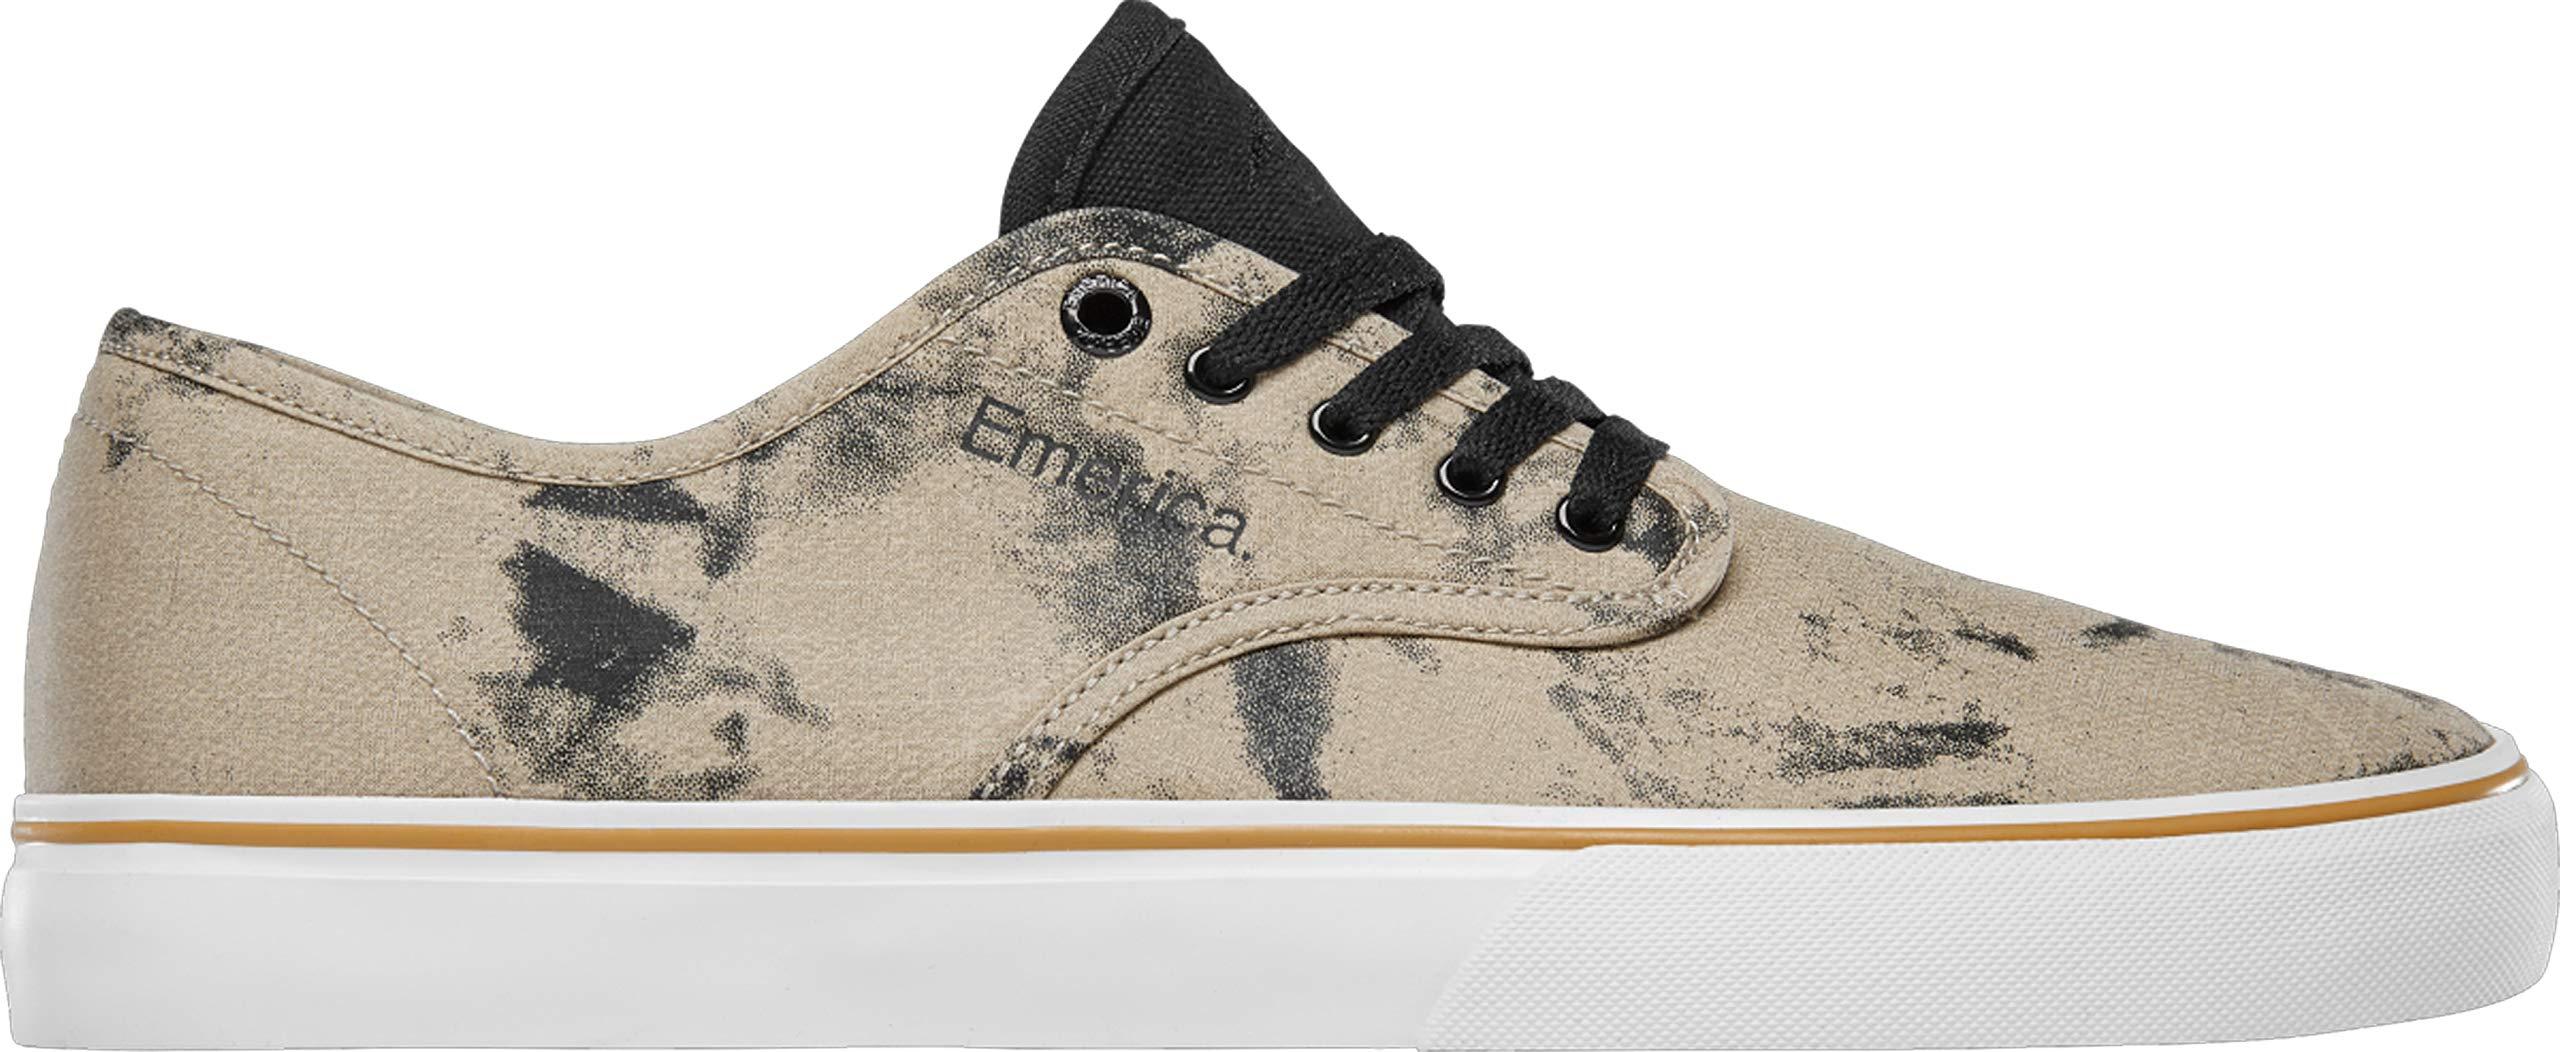 Emerica Men's Wino Standard Skate Shoe, Black